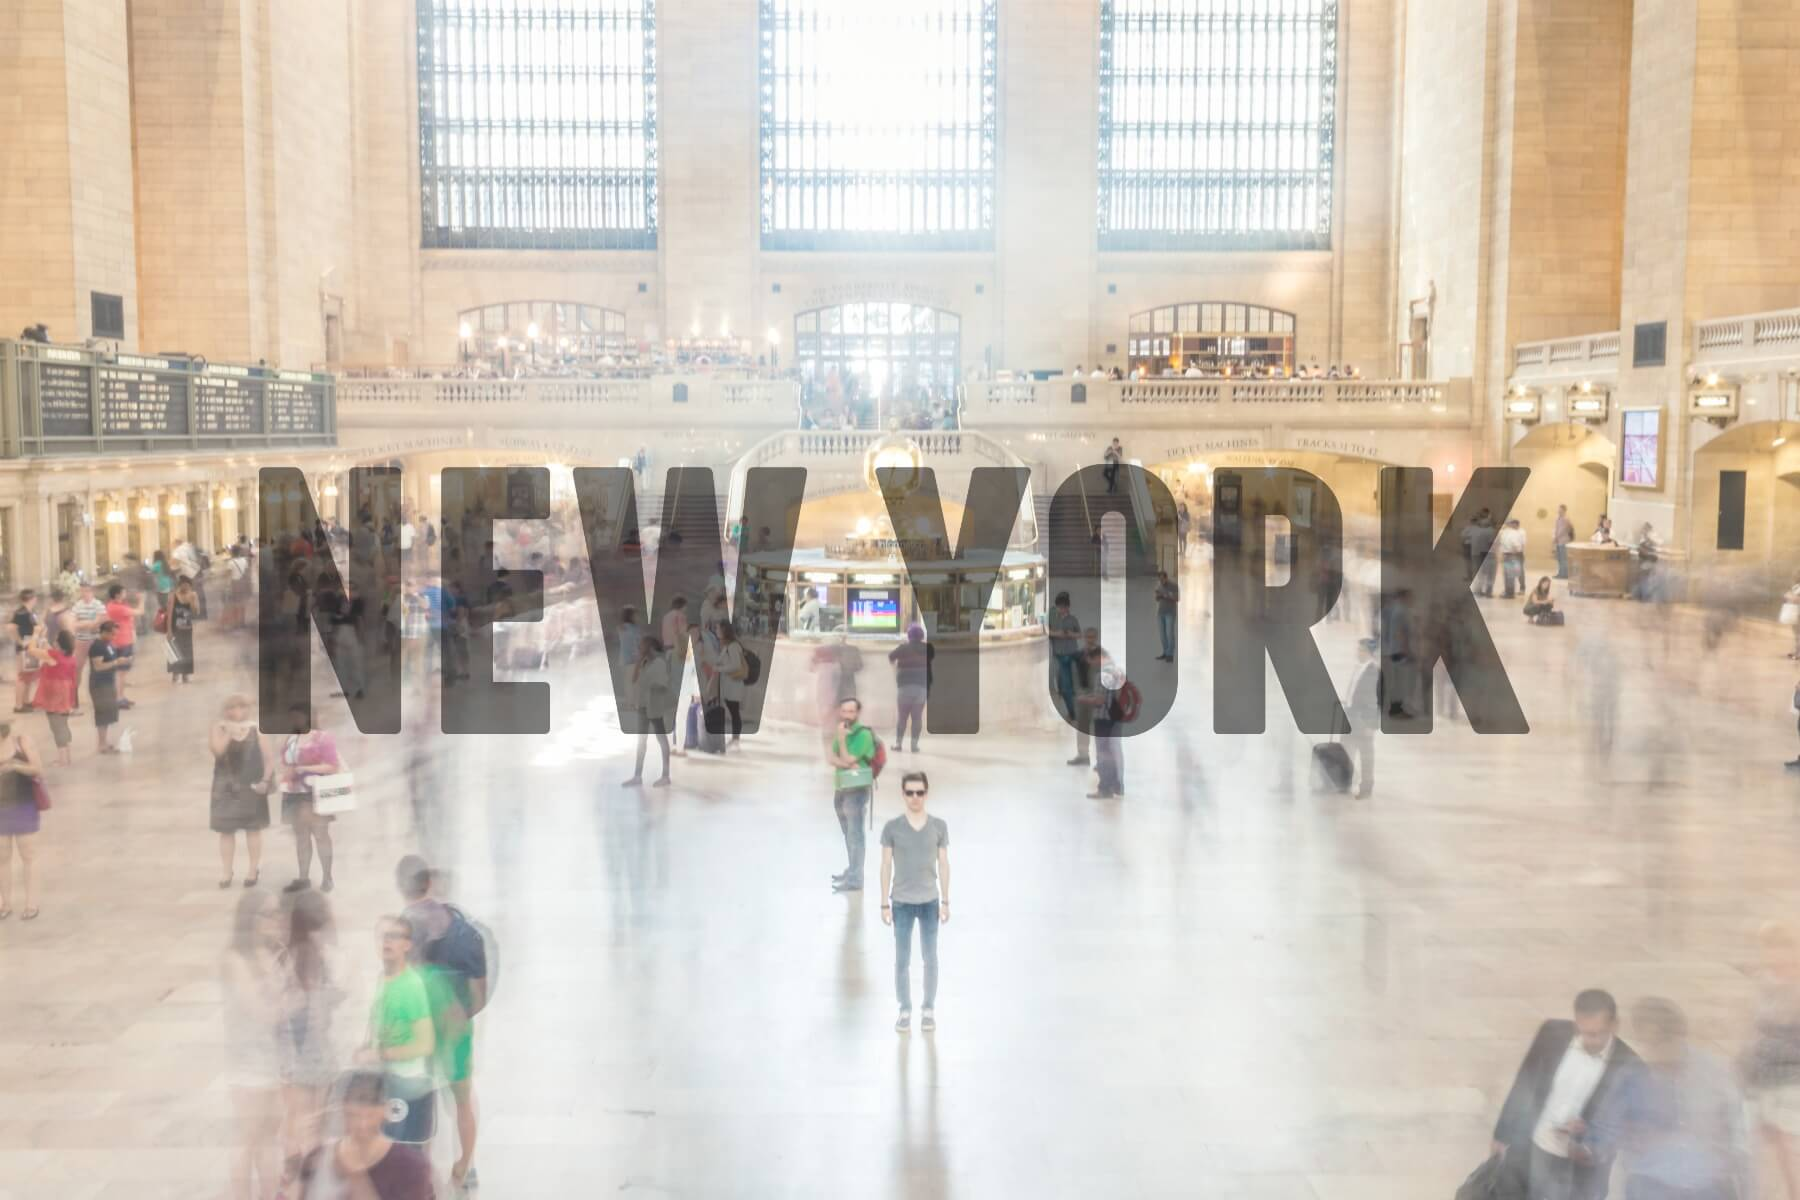 'NEW YORK' (Inside busy train station)